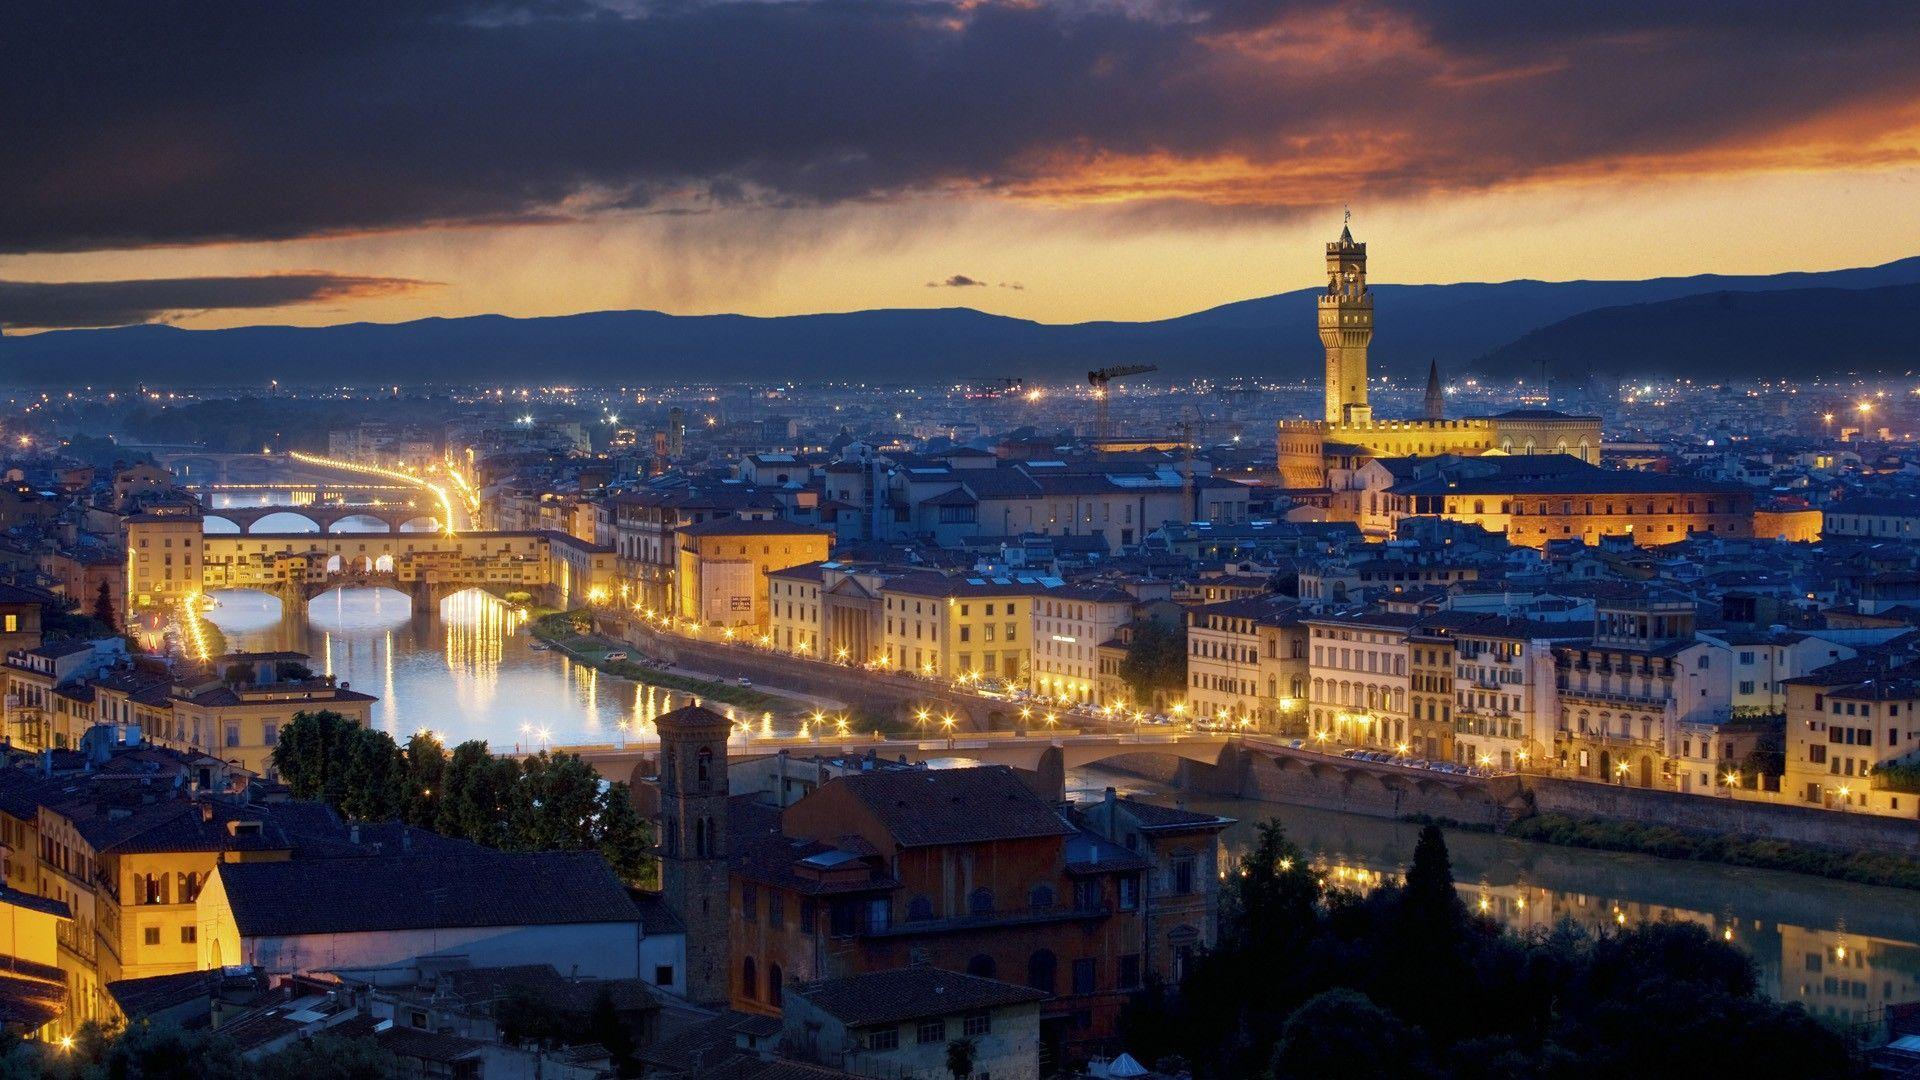 Italy At Night Wallpapers Hd Wallpaper Italy Night